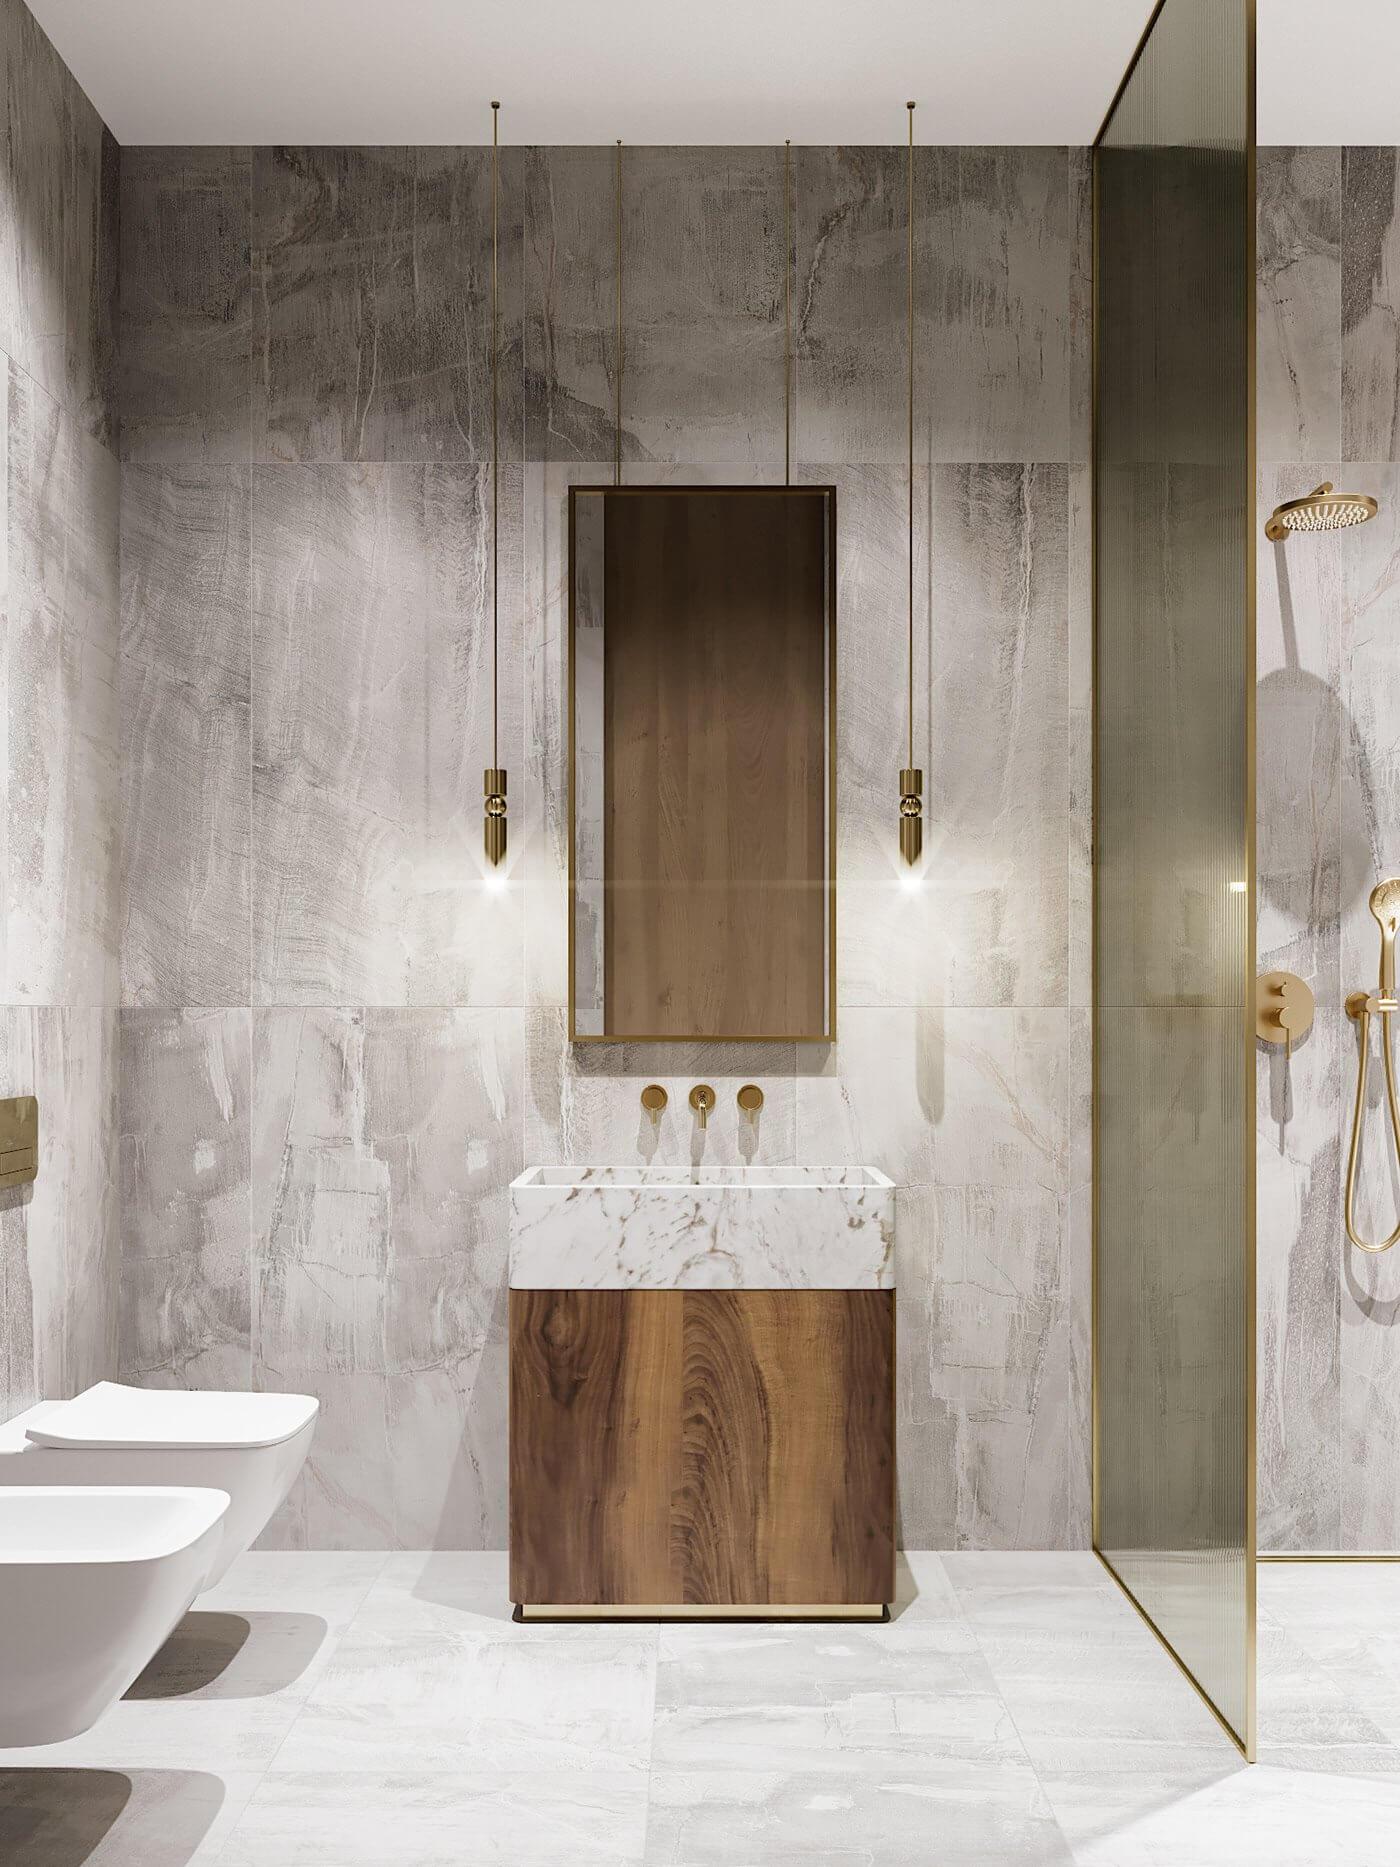 Green gold Apartment bathroom design wood cabinet wash basin wc - cgi visualization